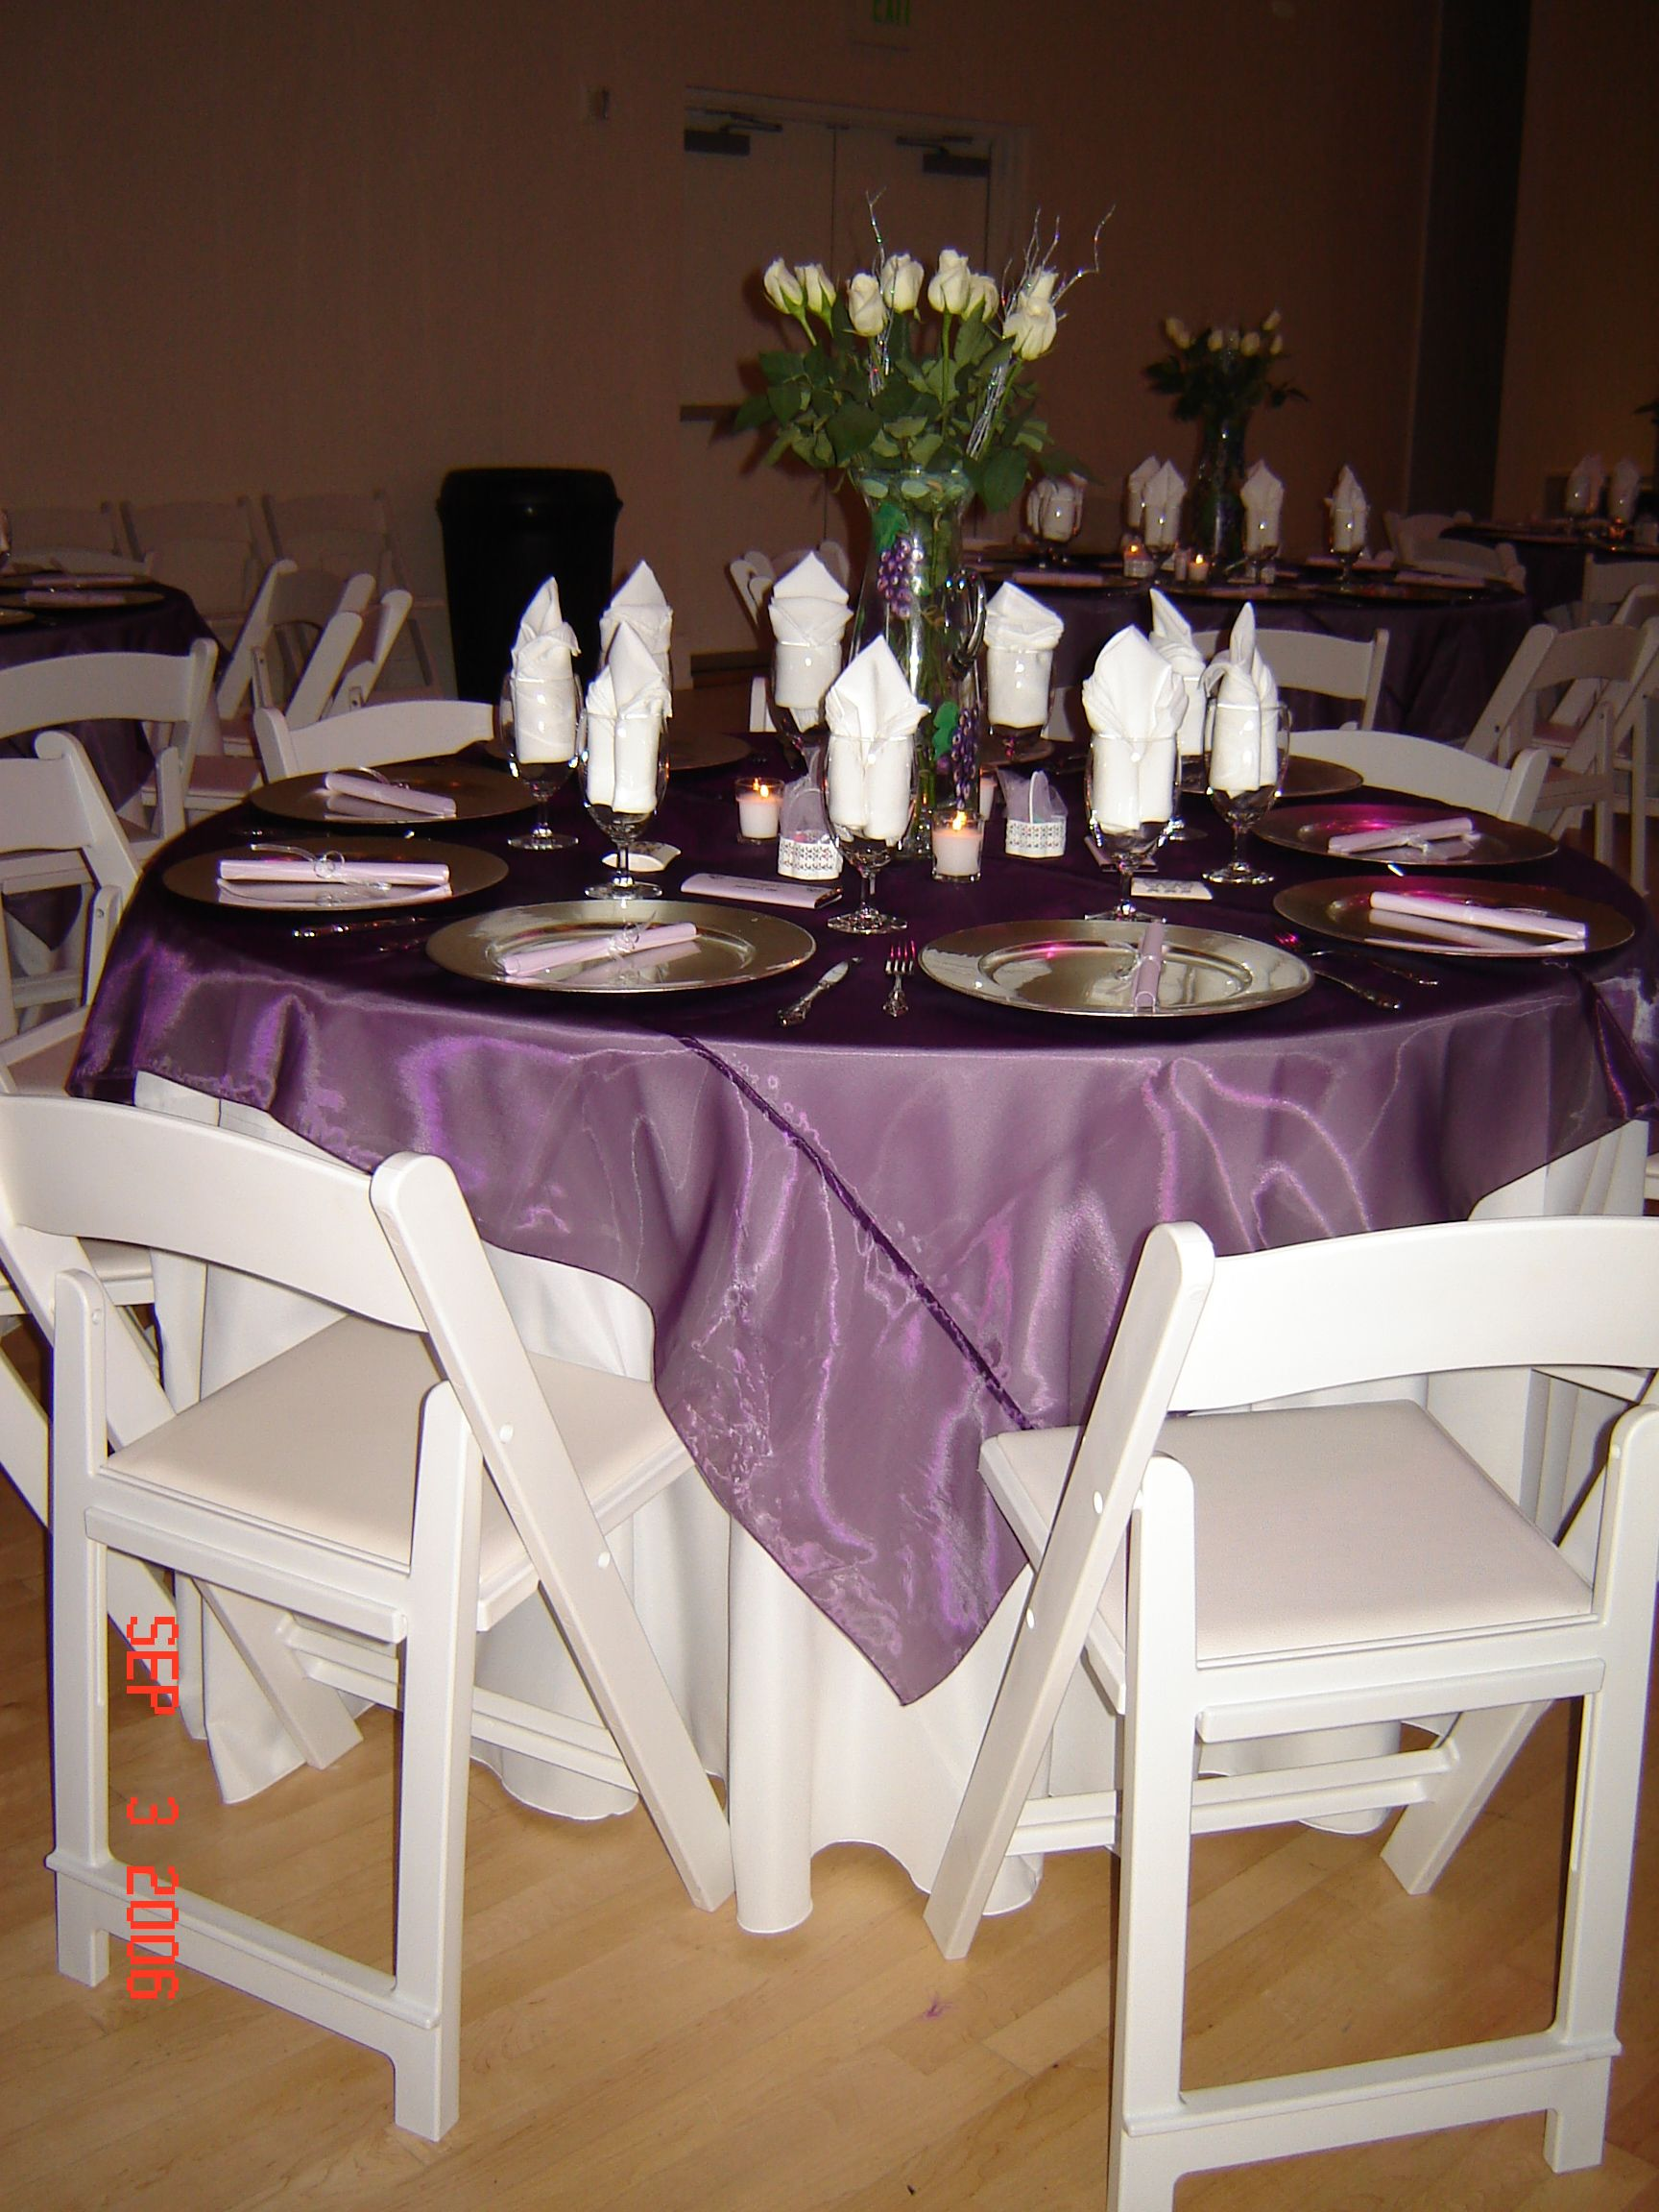 Purple Organza Overlays Simply Elegant Weddings Linen Rentals Fort Worth Dallas Nationwide Wedding Linen Rental Linen Rentals Wedding Linens